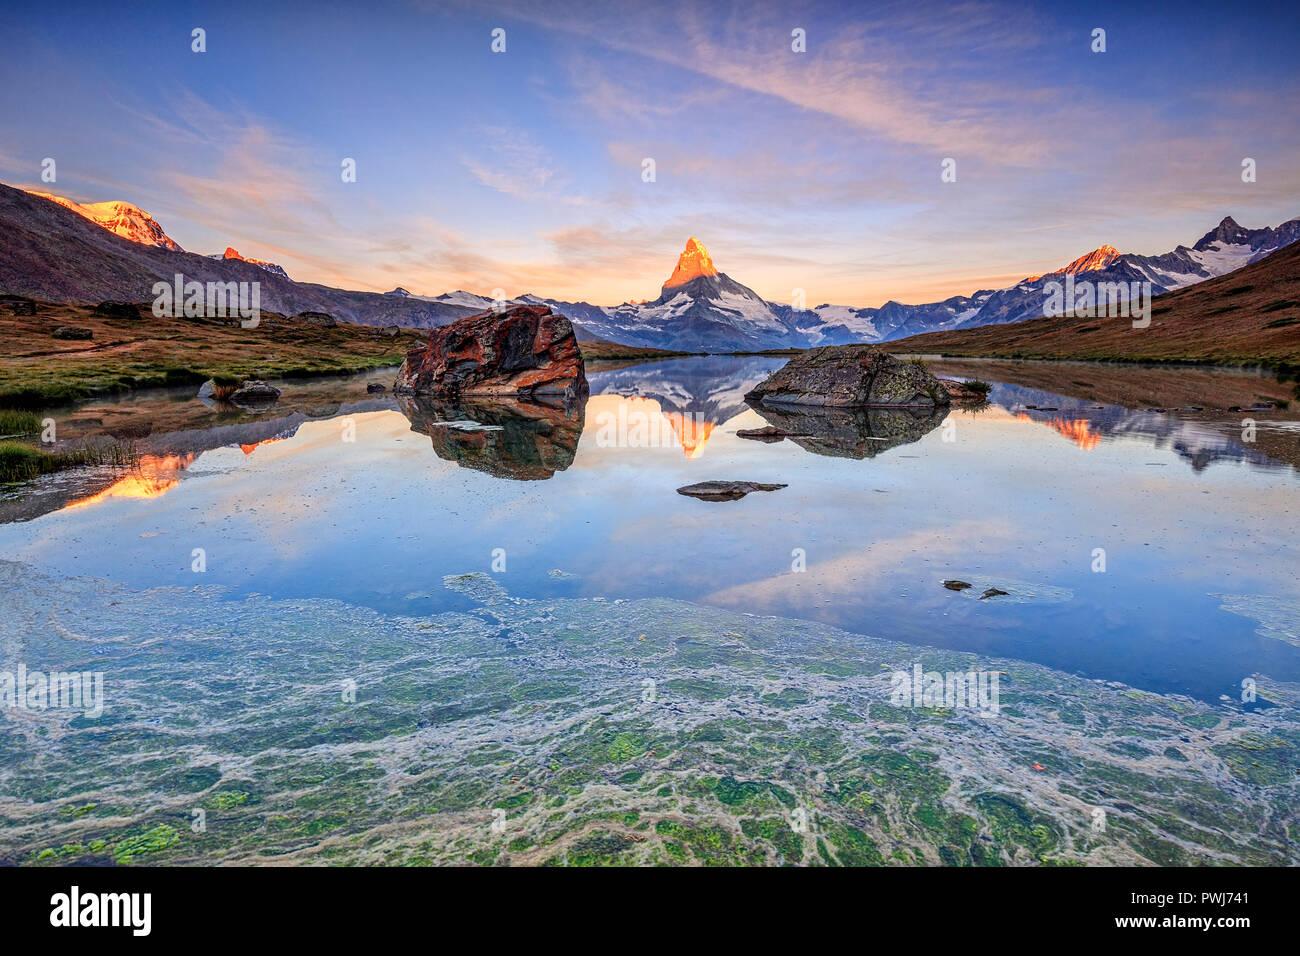 The Matterhorn reflected in Lake Stellisee at dawn Zermatt Pennine Alps Canton of Valais Switzerland Europe Stock Photo